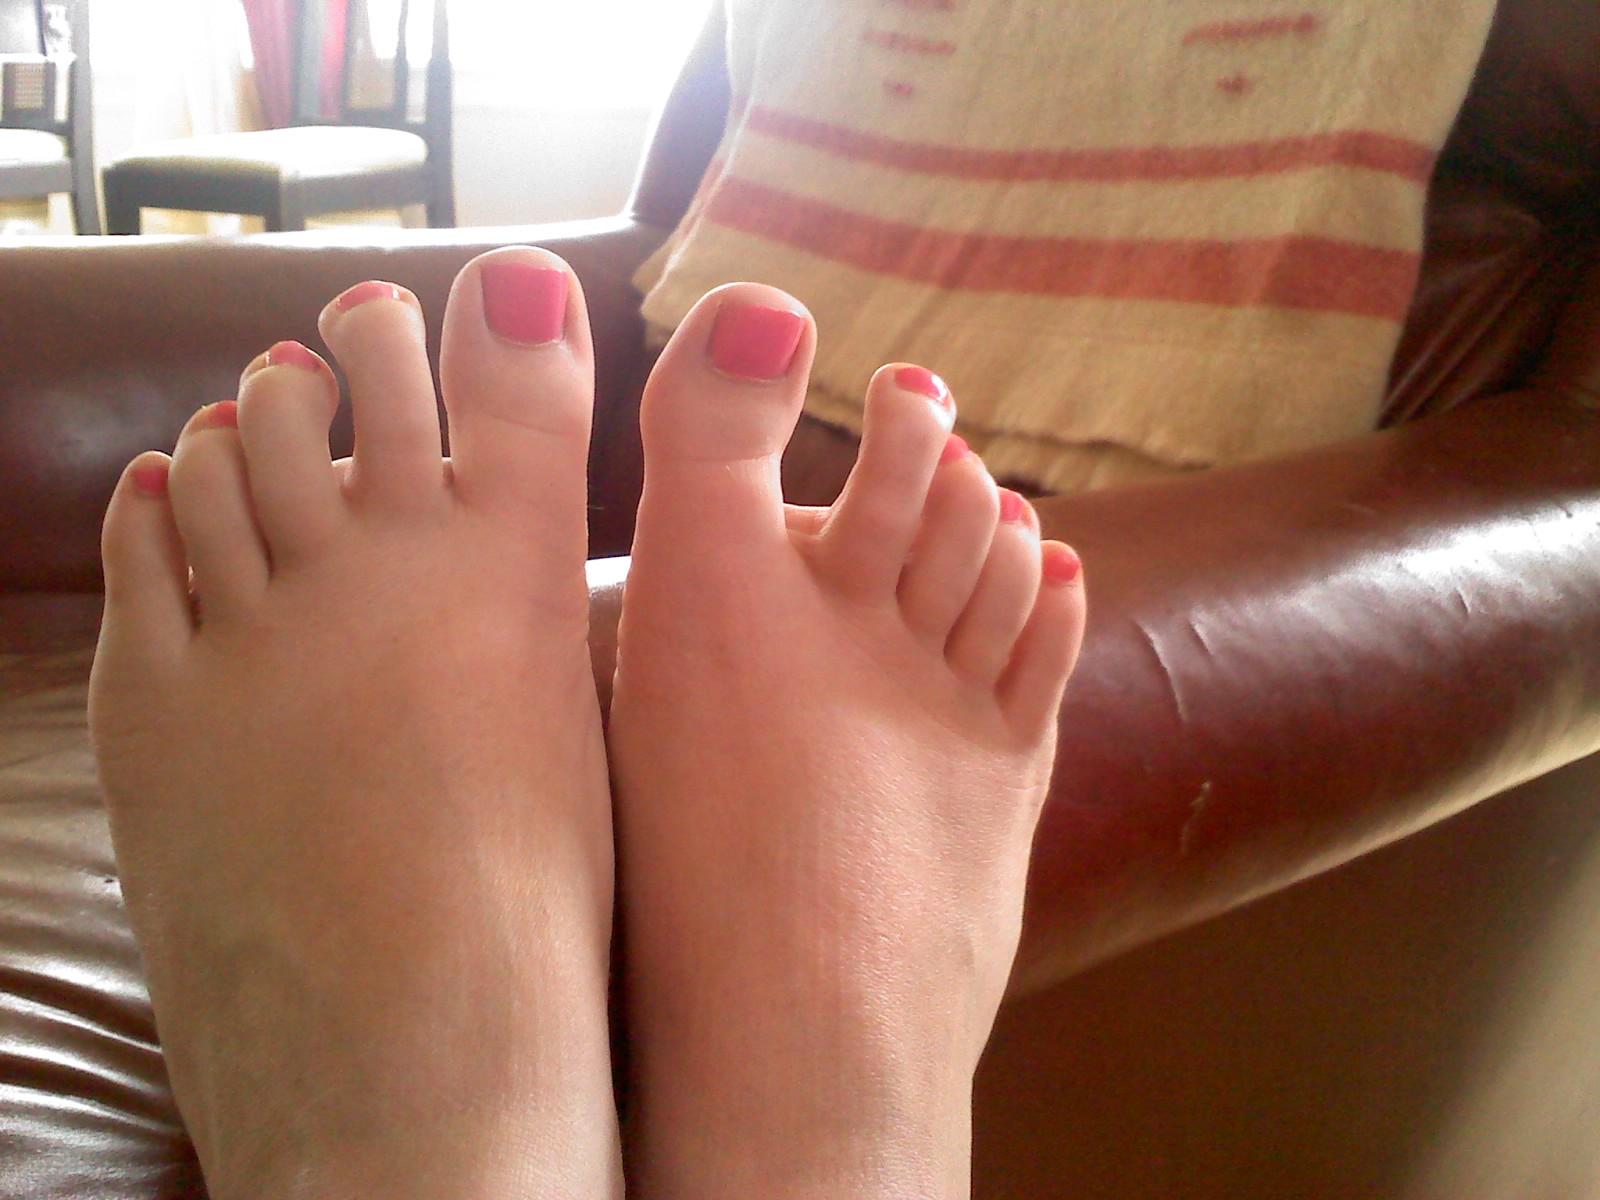 Painted teen feet